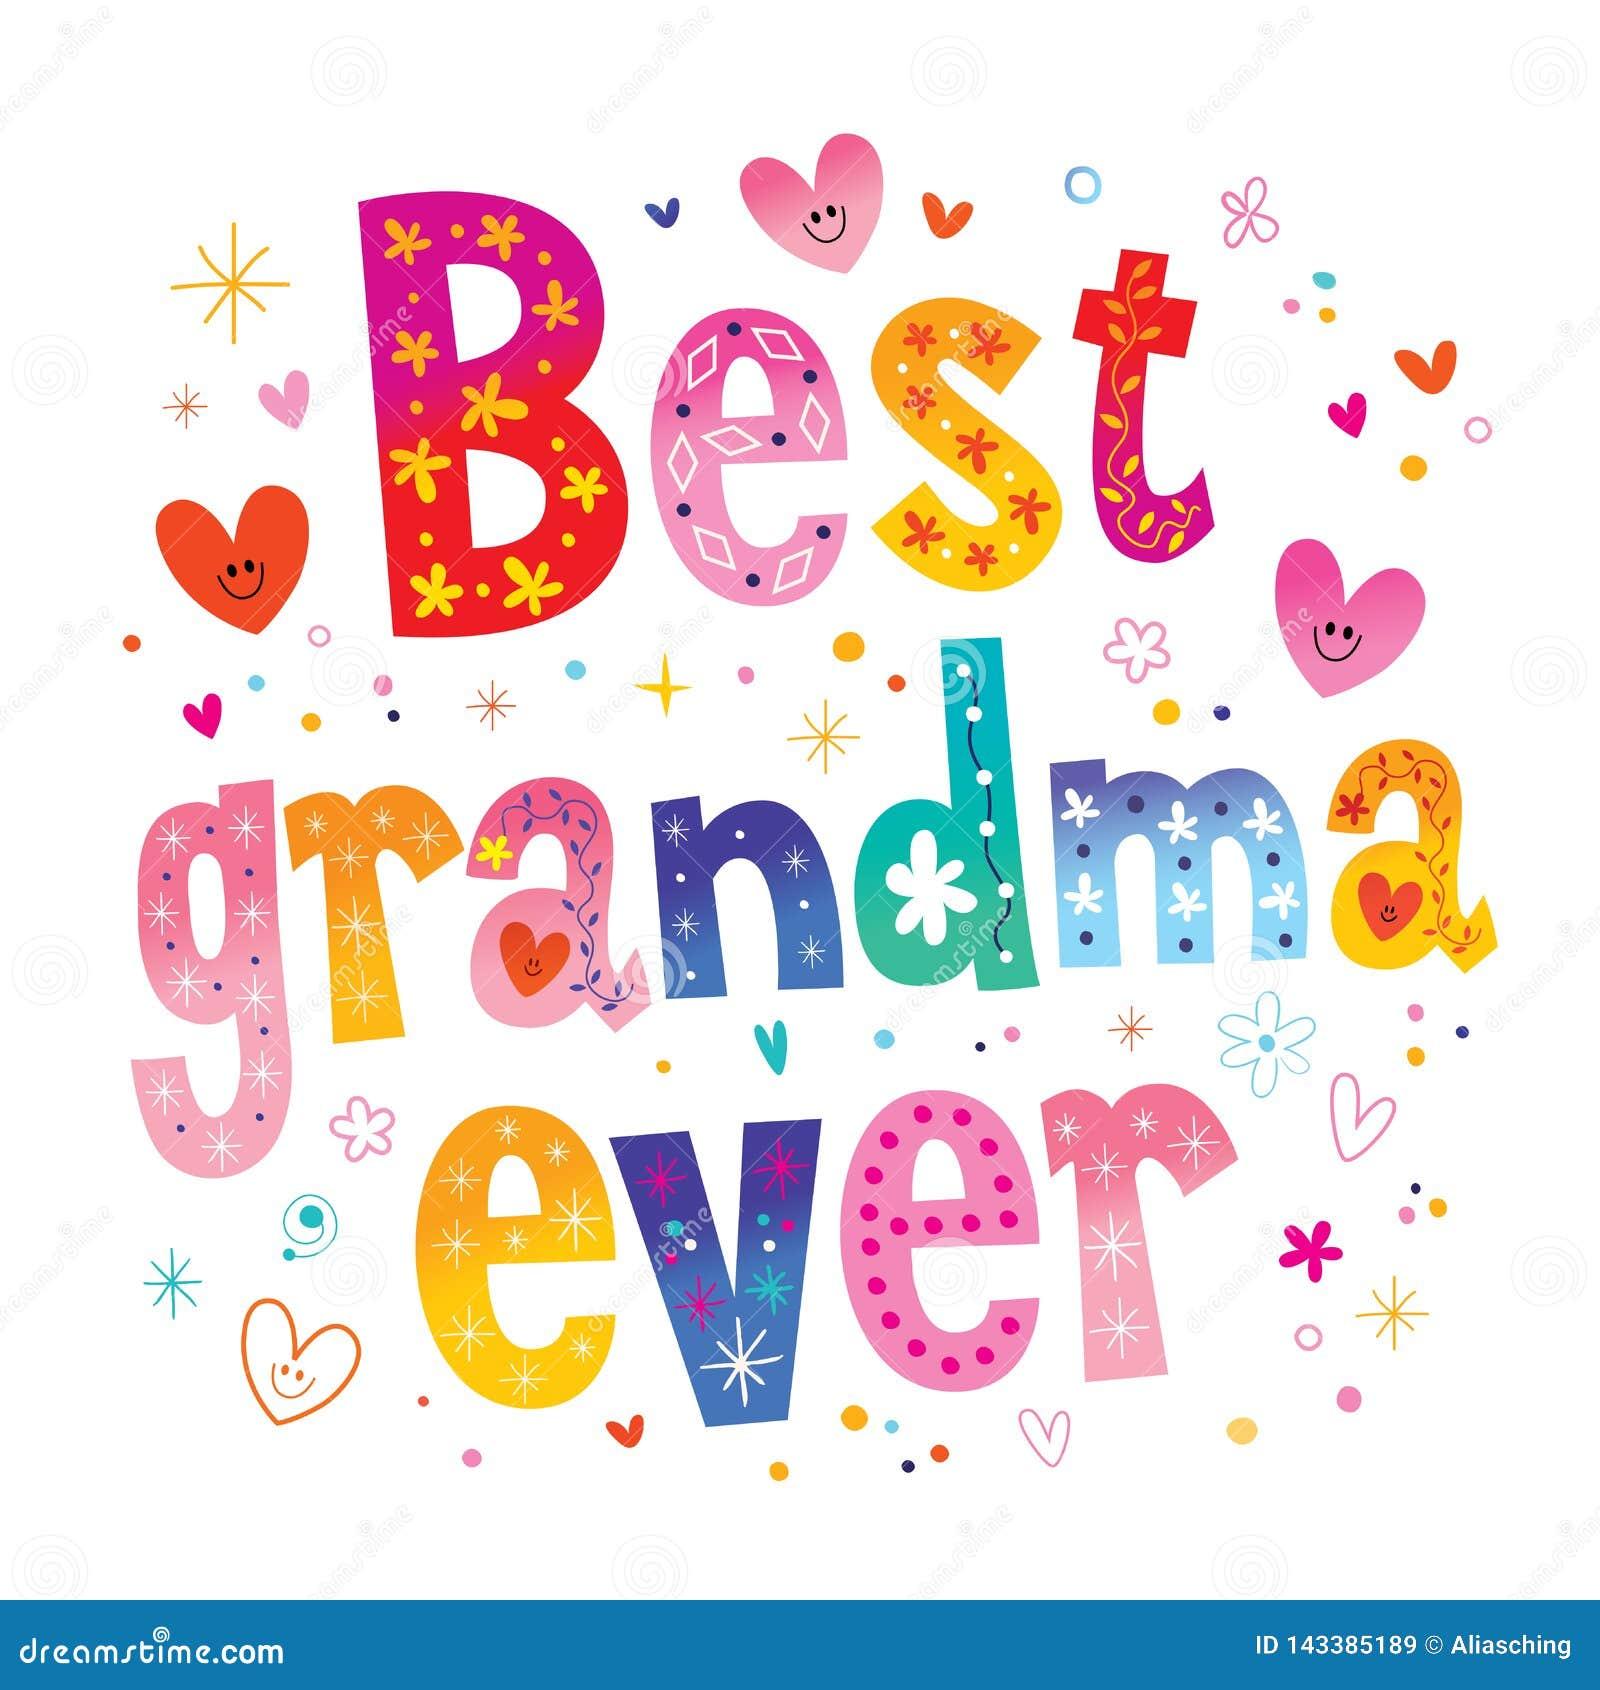 Beste oma ooit